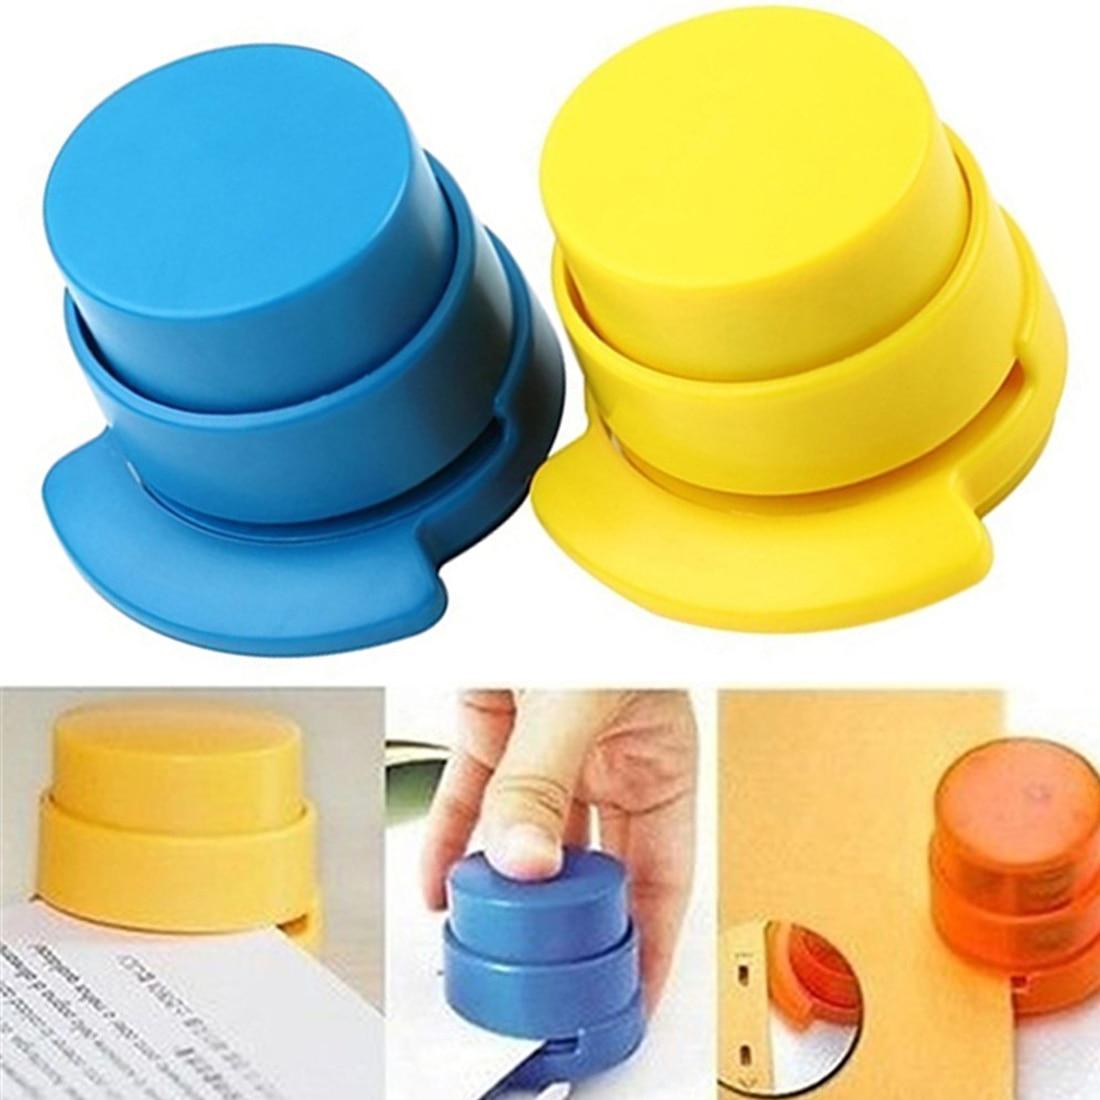 Hot Staple-Free Stapler Colorful Environmental Protection Stapleless Office  Home Paper Binding Binder